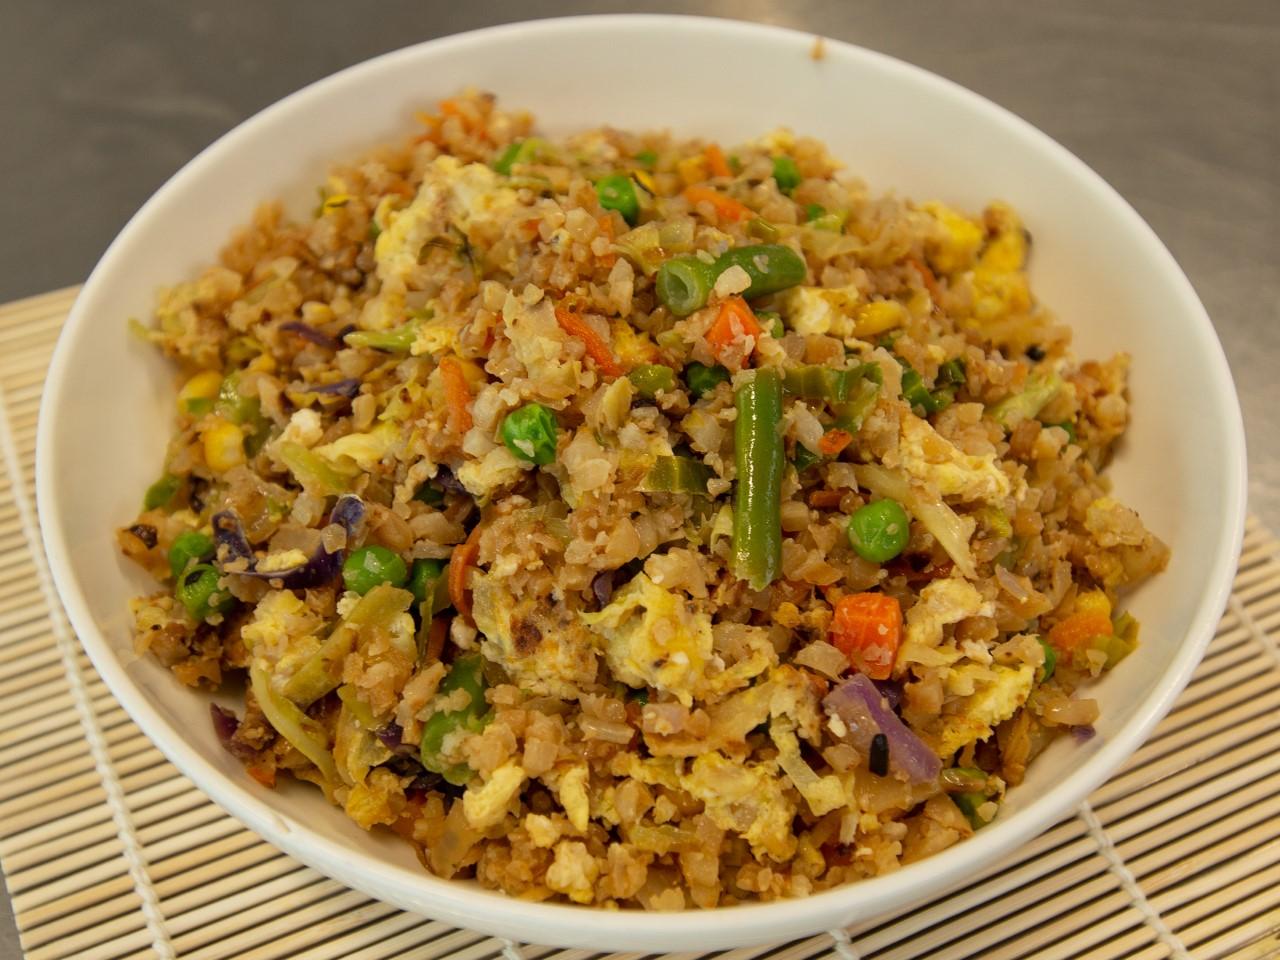 wd-Cauliflower Rice Image